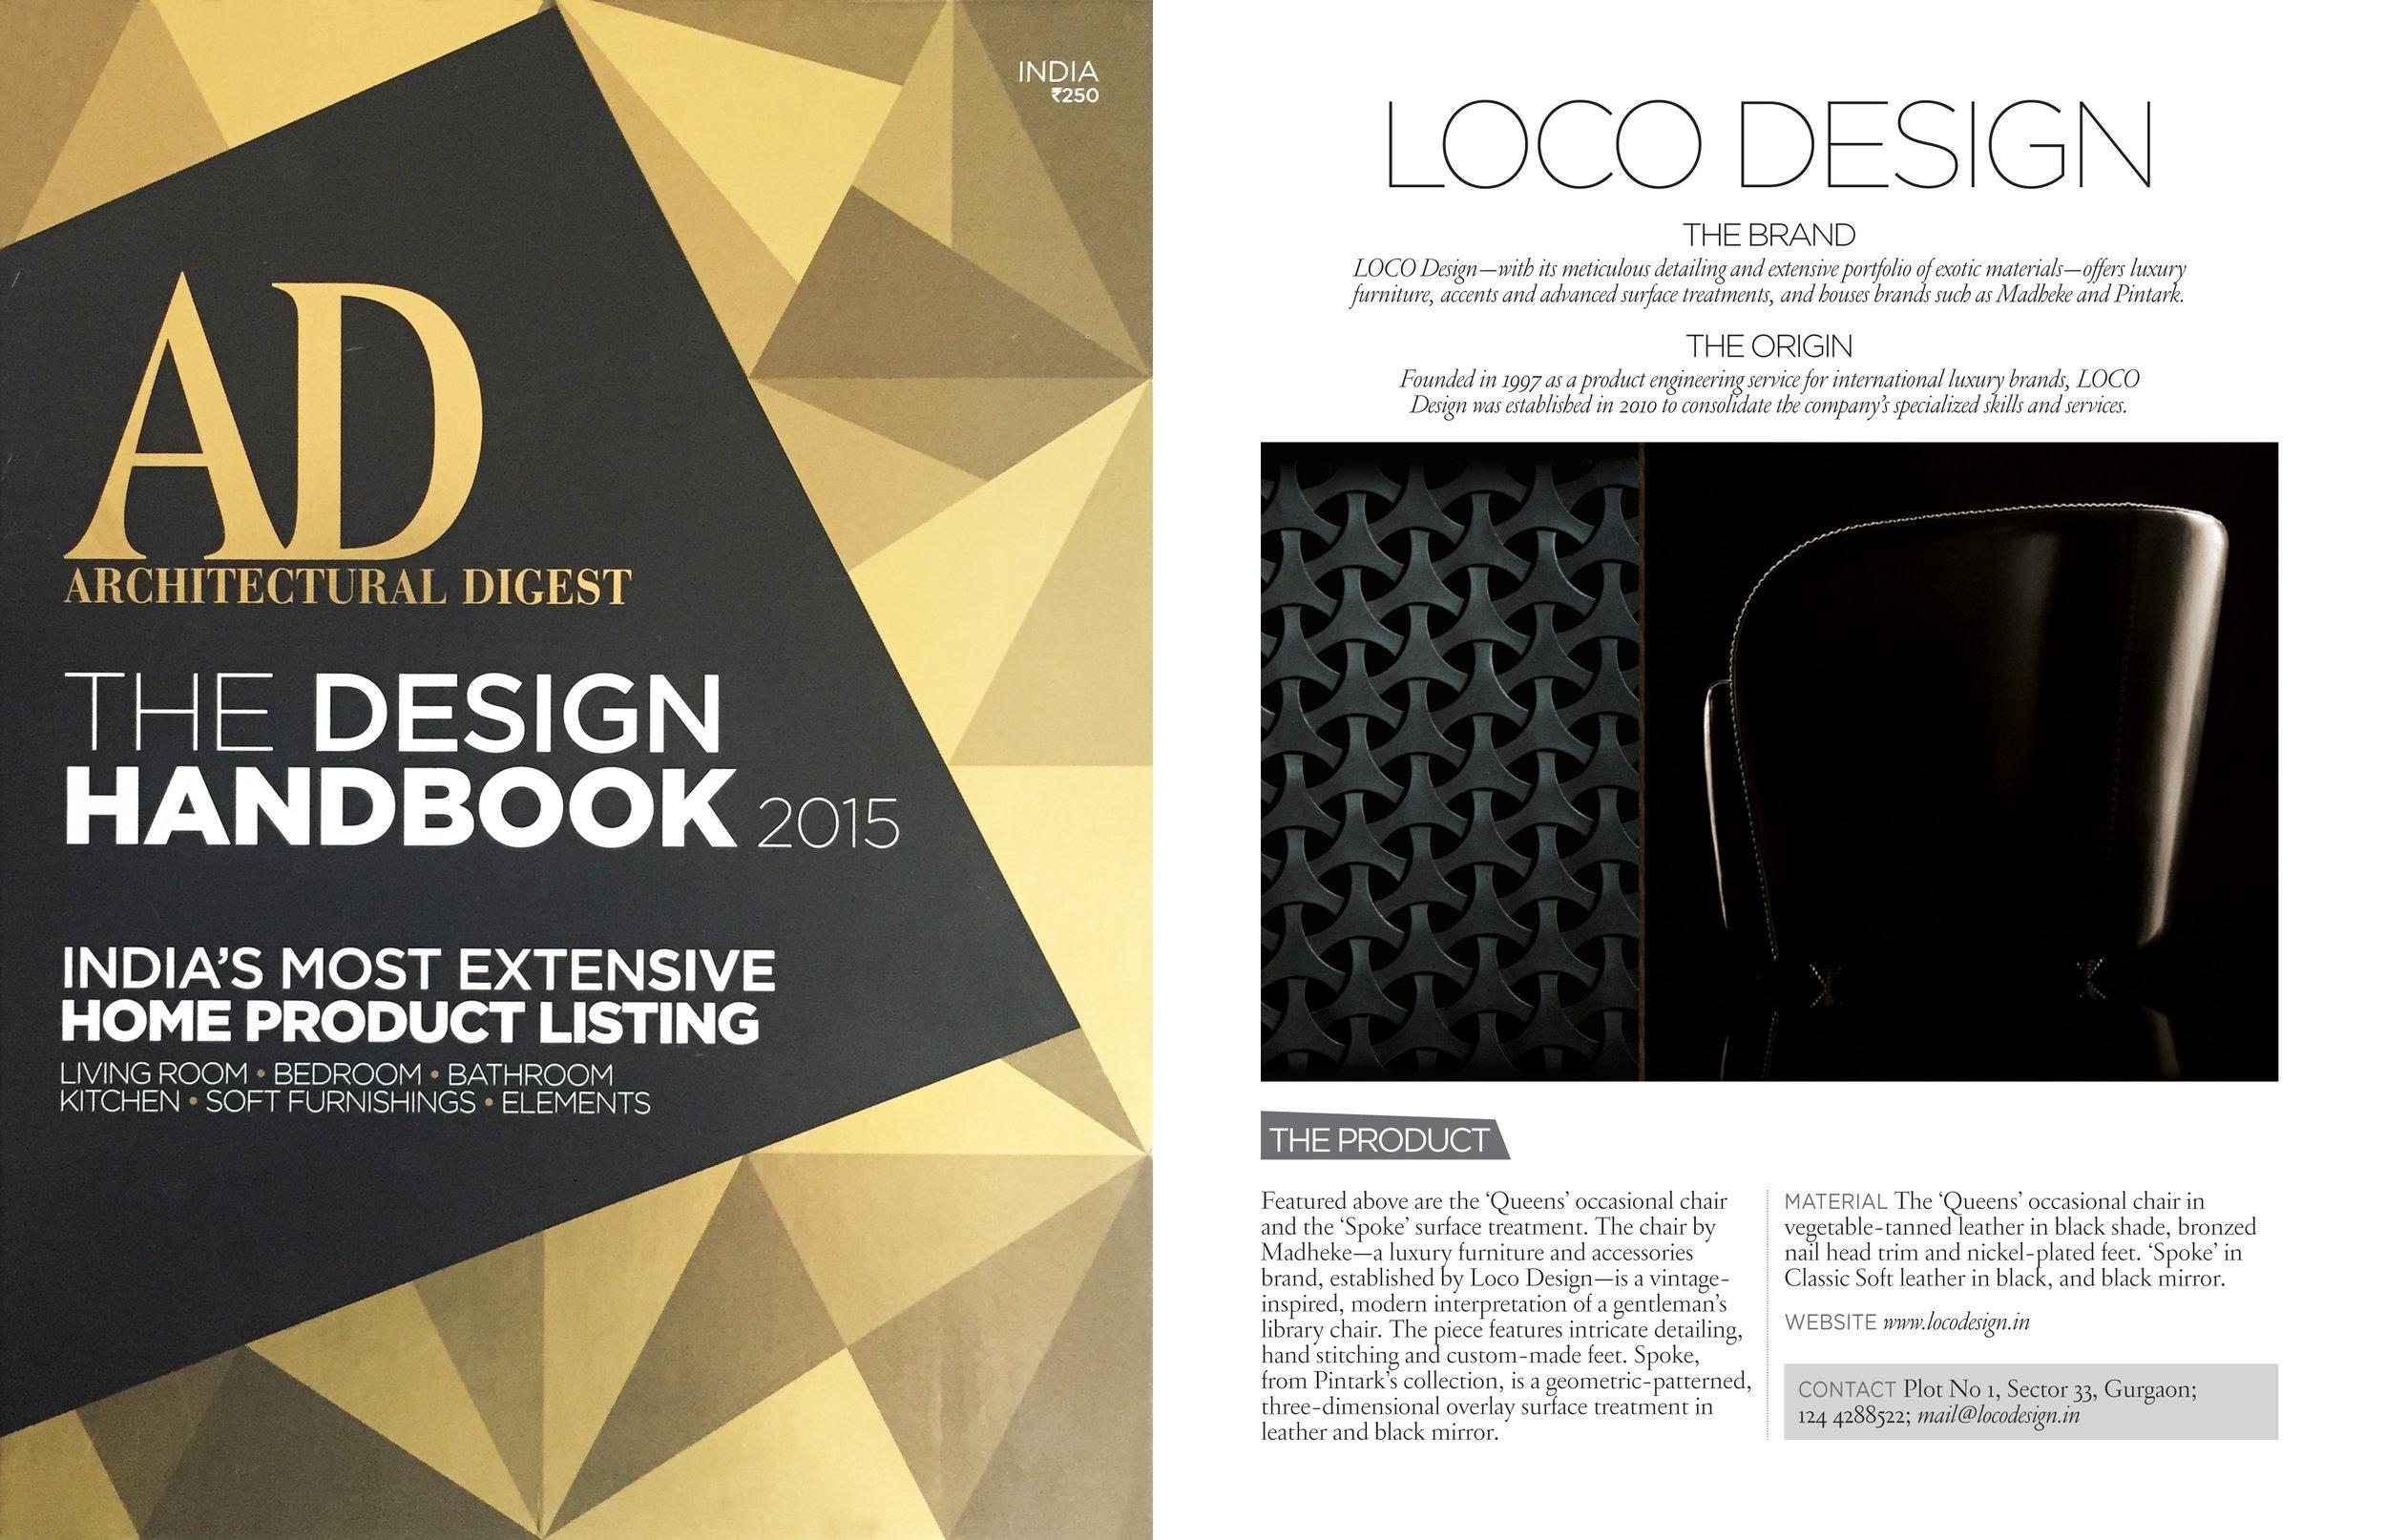 2015 The Design Handbook AD.jpg